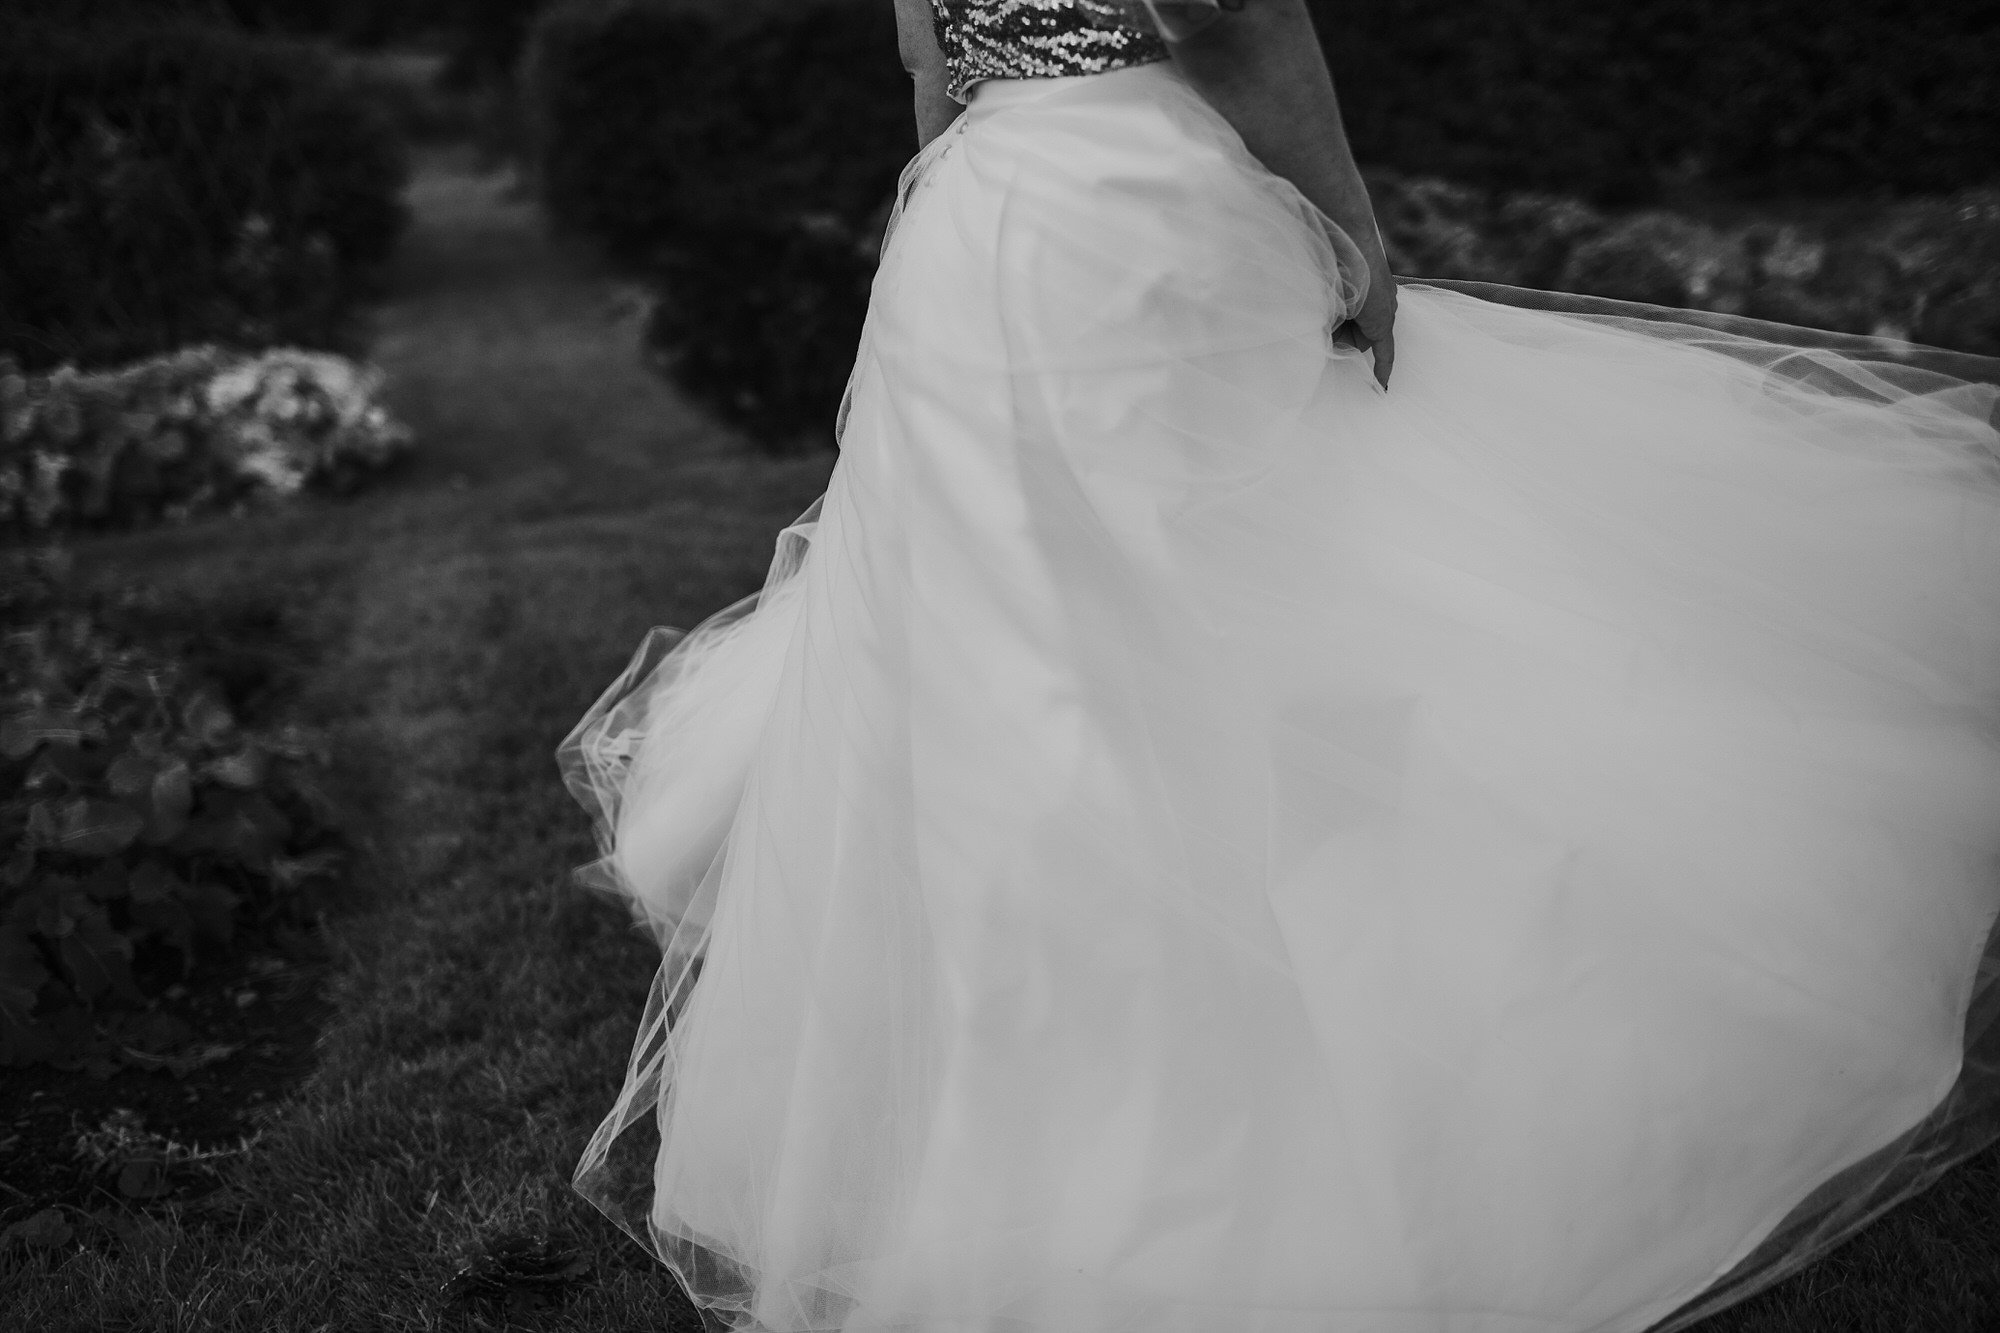 056 TIN SHED KNOCKRAICH FARM WEDDING ALTERNATIVE BRIDE ZOE ALEXANDRA PHOTOGRAPHY